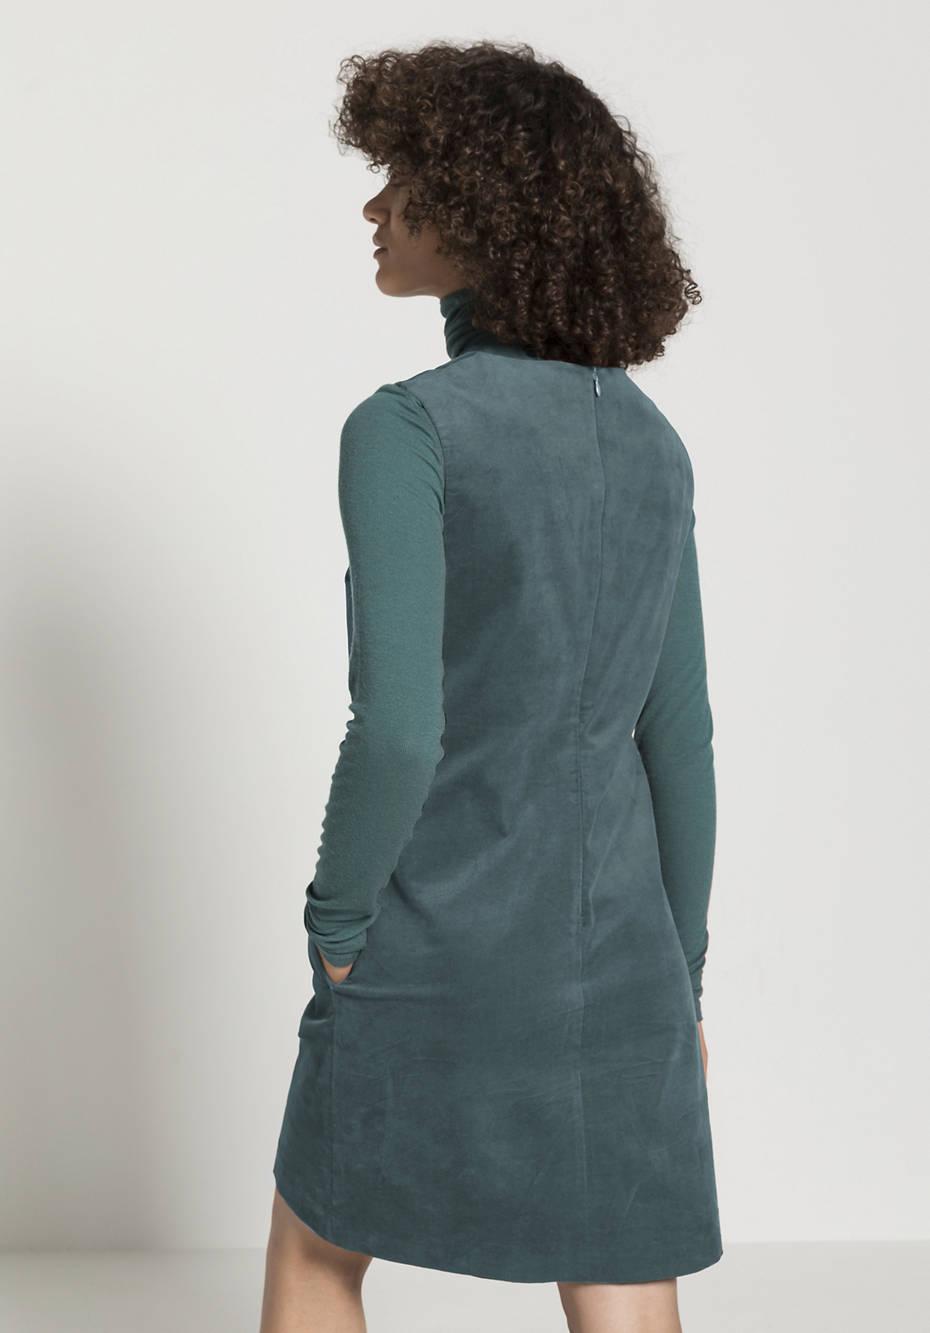 Velvet dress made of organic cotton with hemp